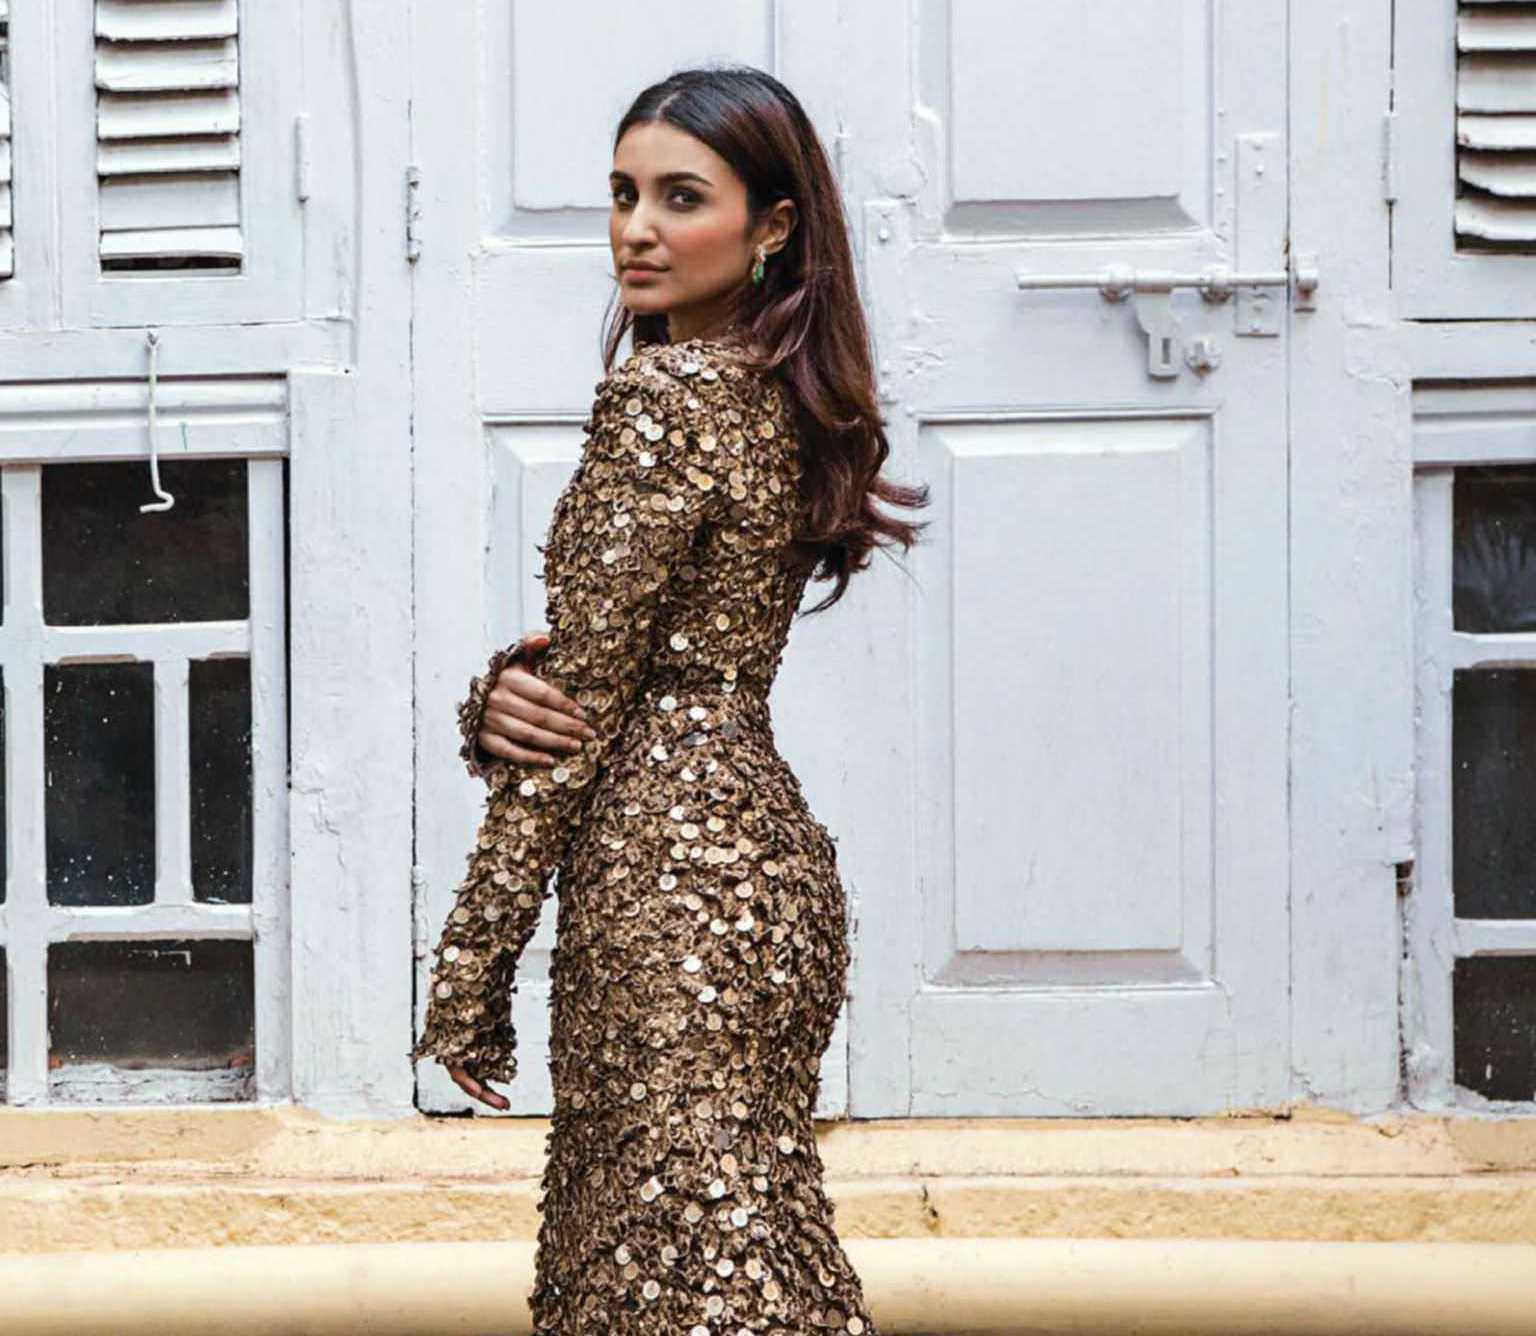 The New Shape and Confidence Of Parineeti Chopra